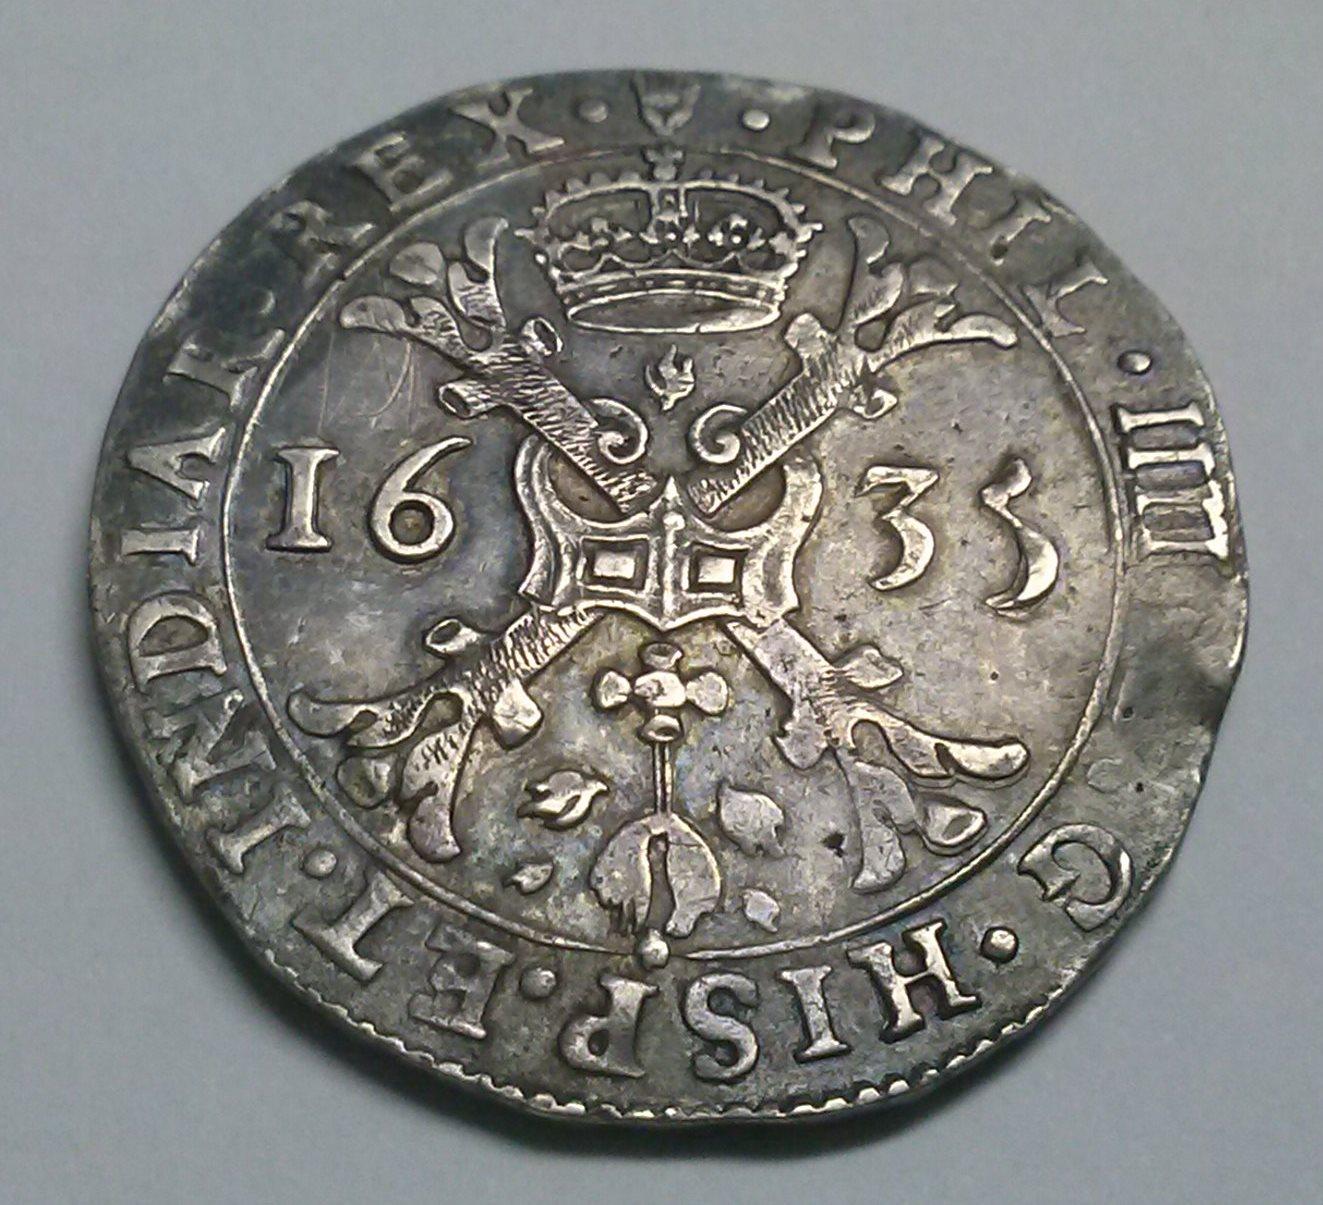 Patagón de 1635 a nombre de Felipe IV (Amberes) Jrz6f6